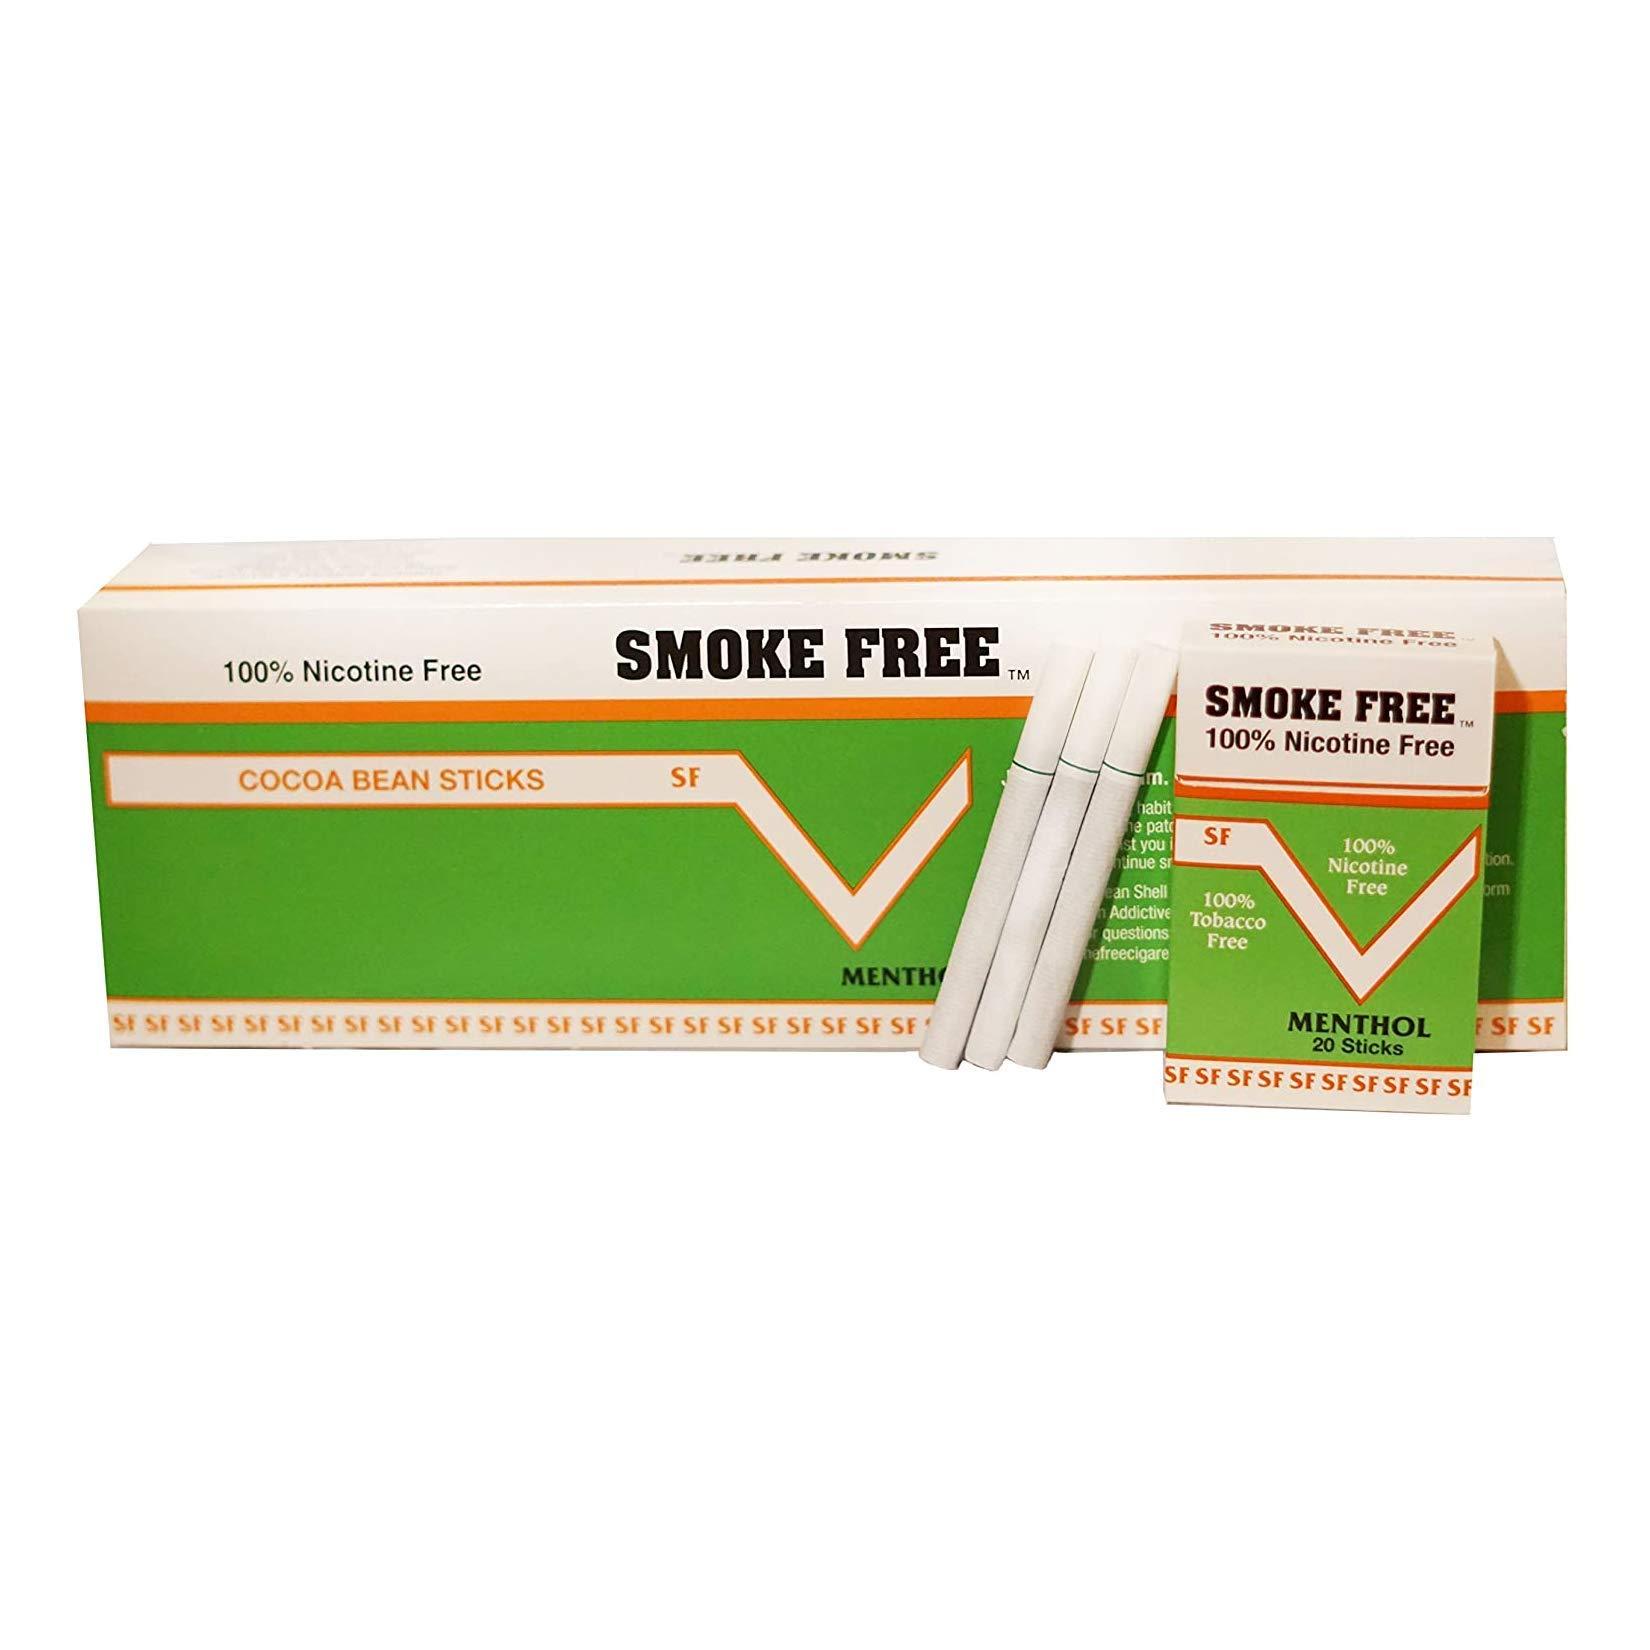 (Carton 10 Packs) 100% Nicotine Free(Cocoa Bean Sticks) Menthol Flavor